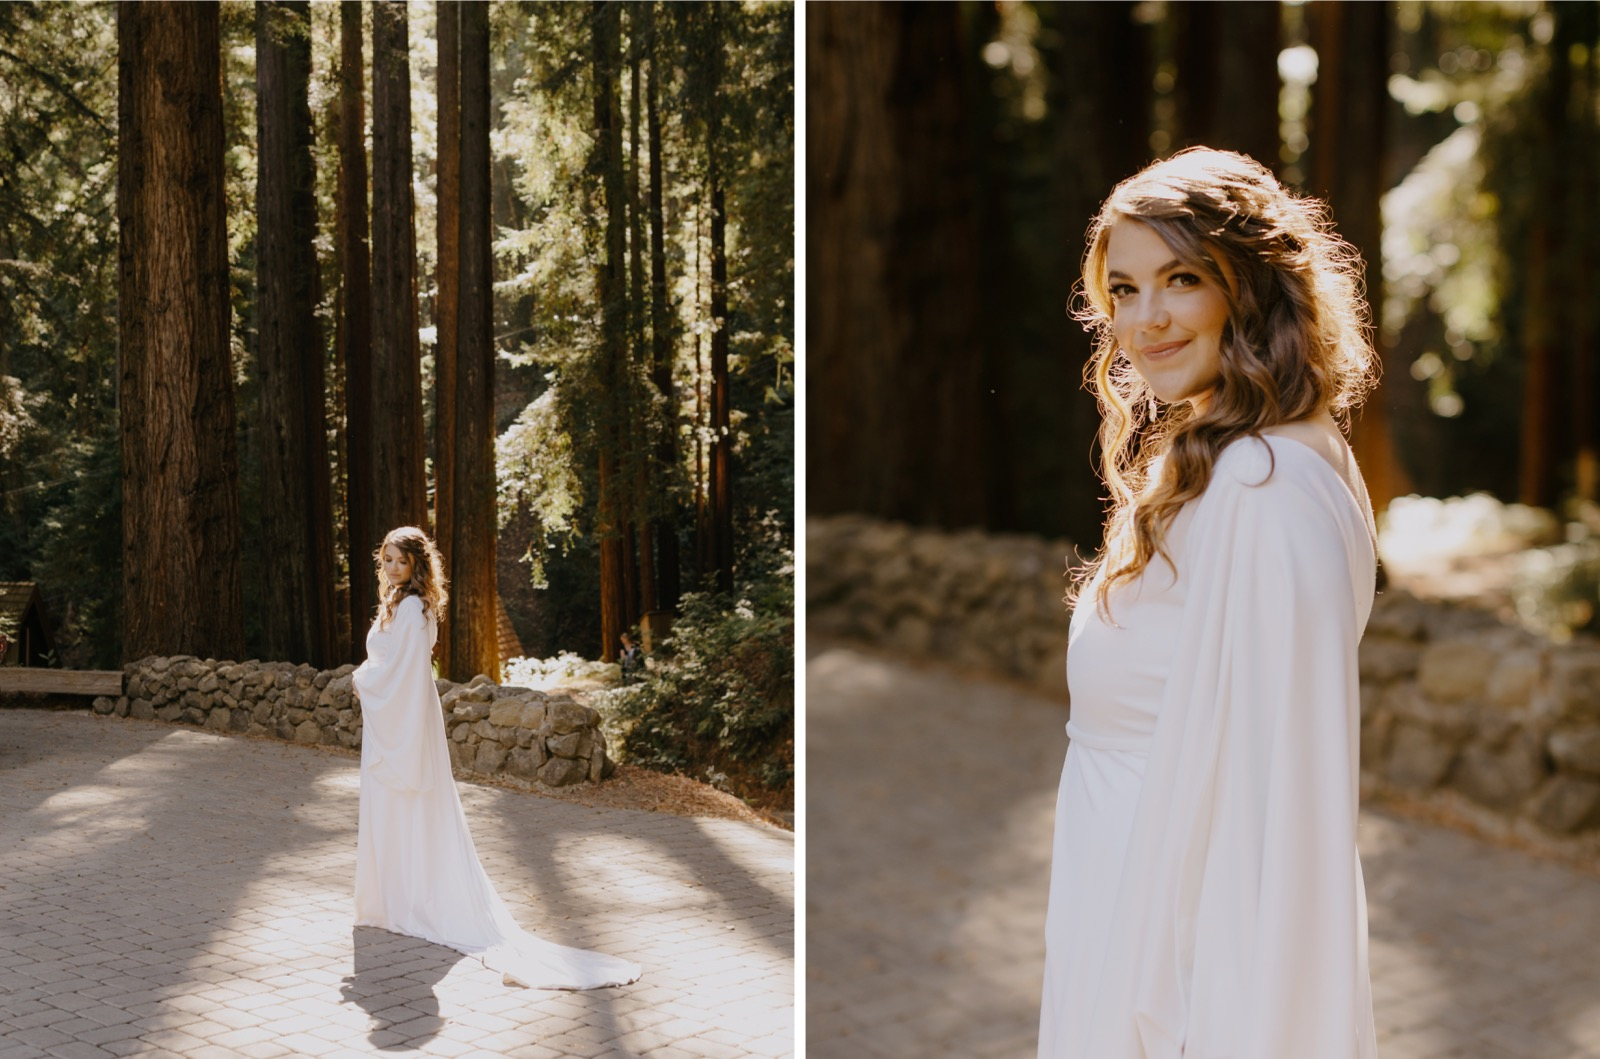 038_Emily & Jeff Wedding 0307_Emily & Jeff Wedding 0306_outdoor_waterfall-lodge_forest_wedding_portrait_intimate